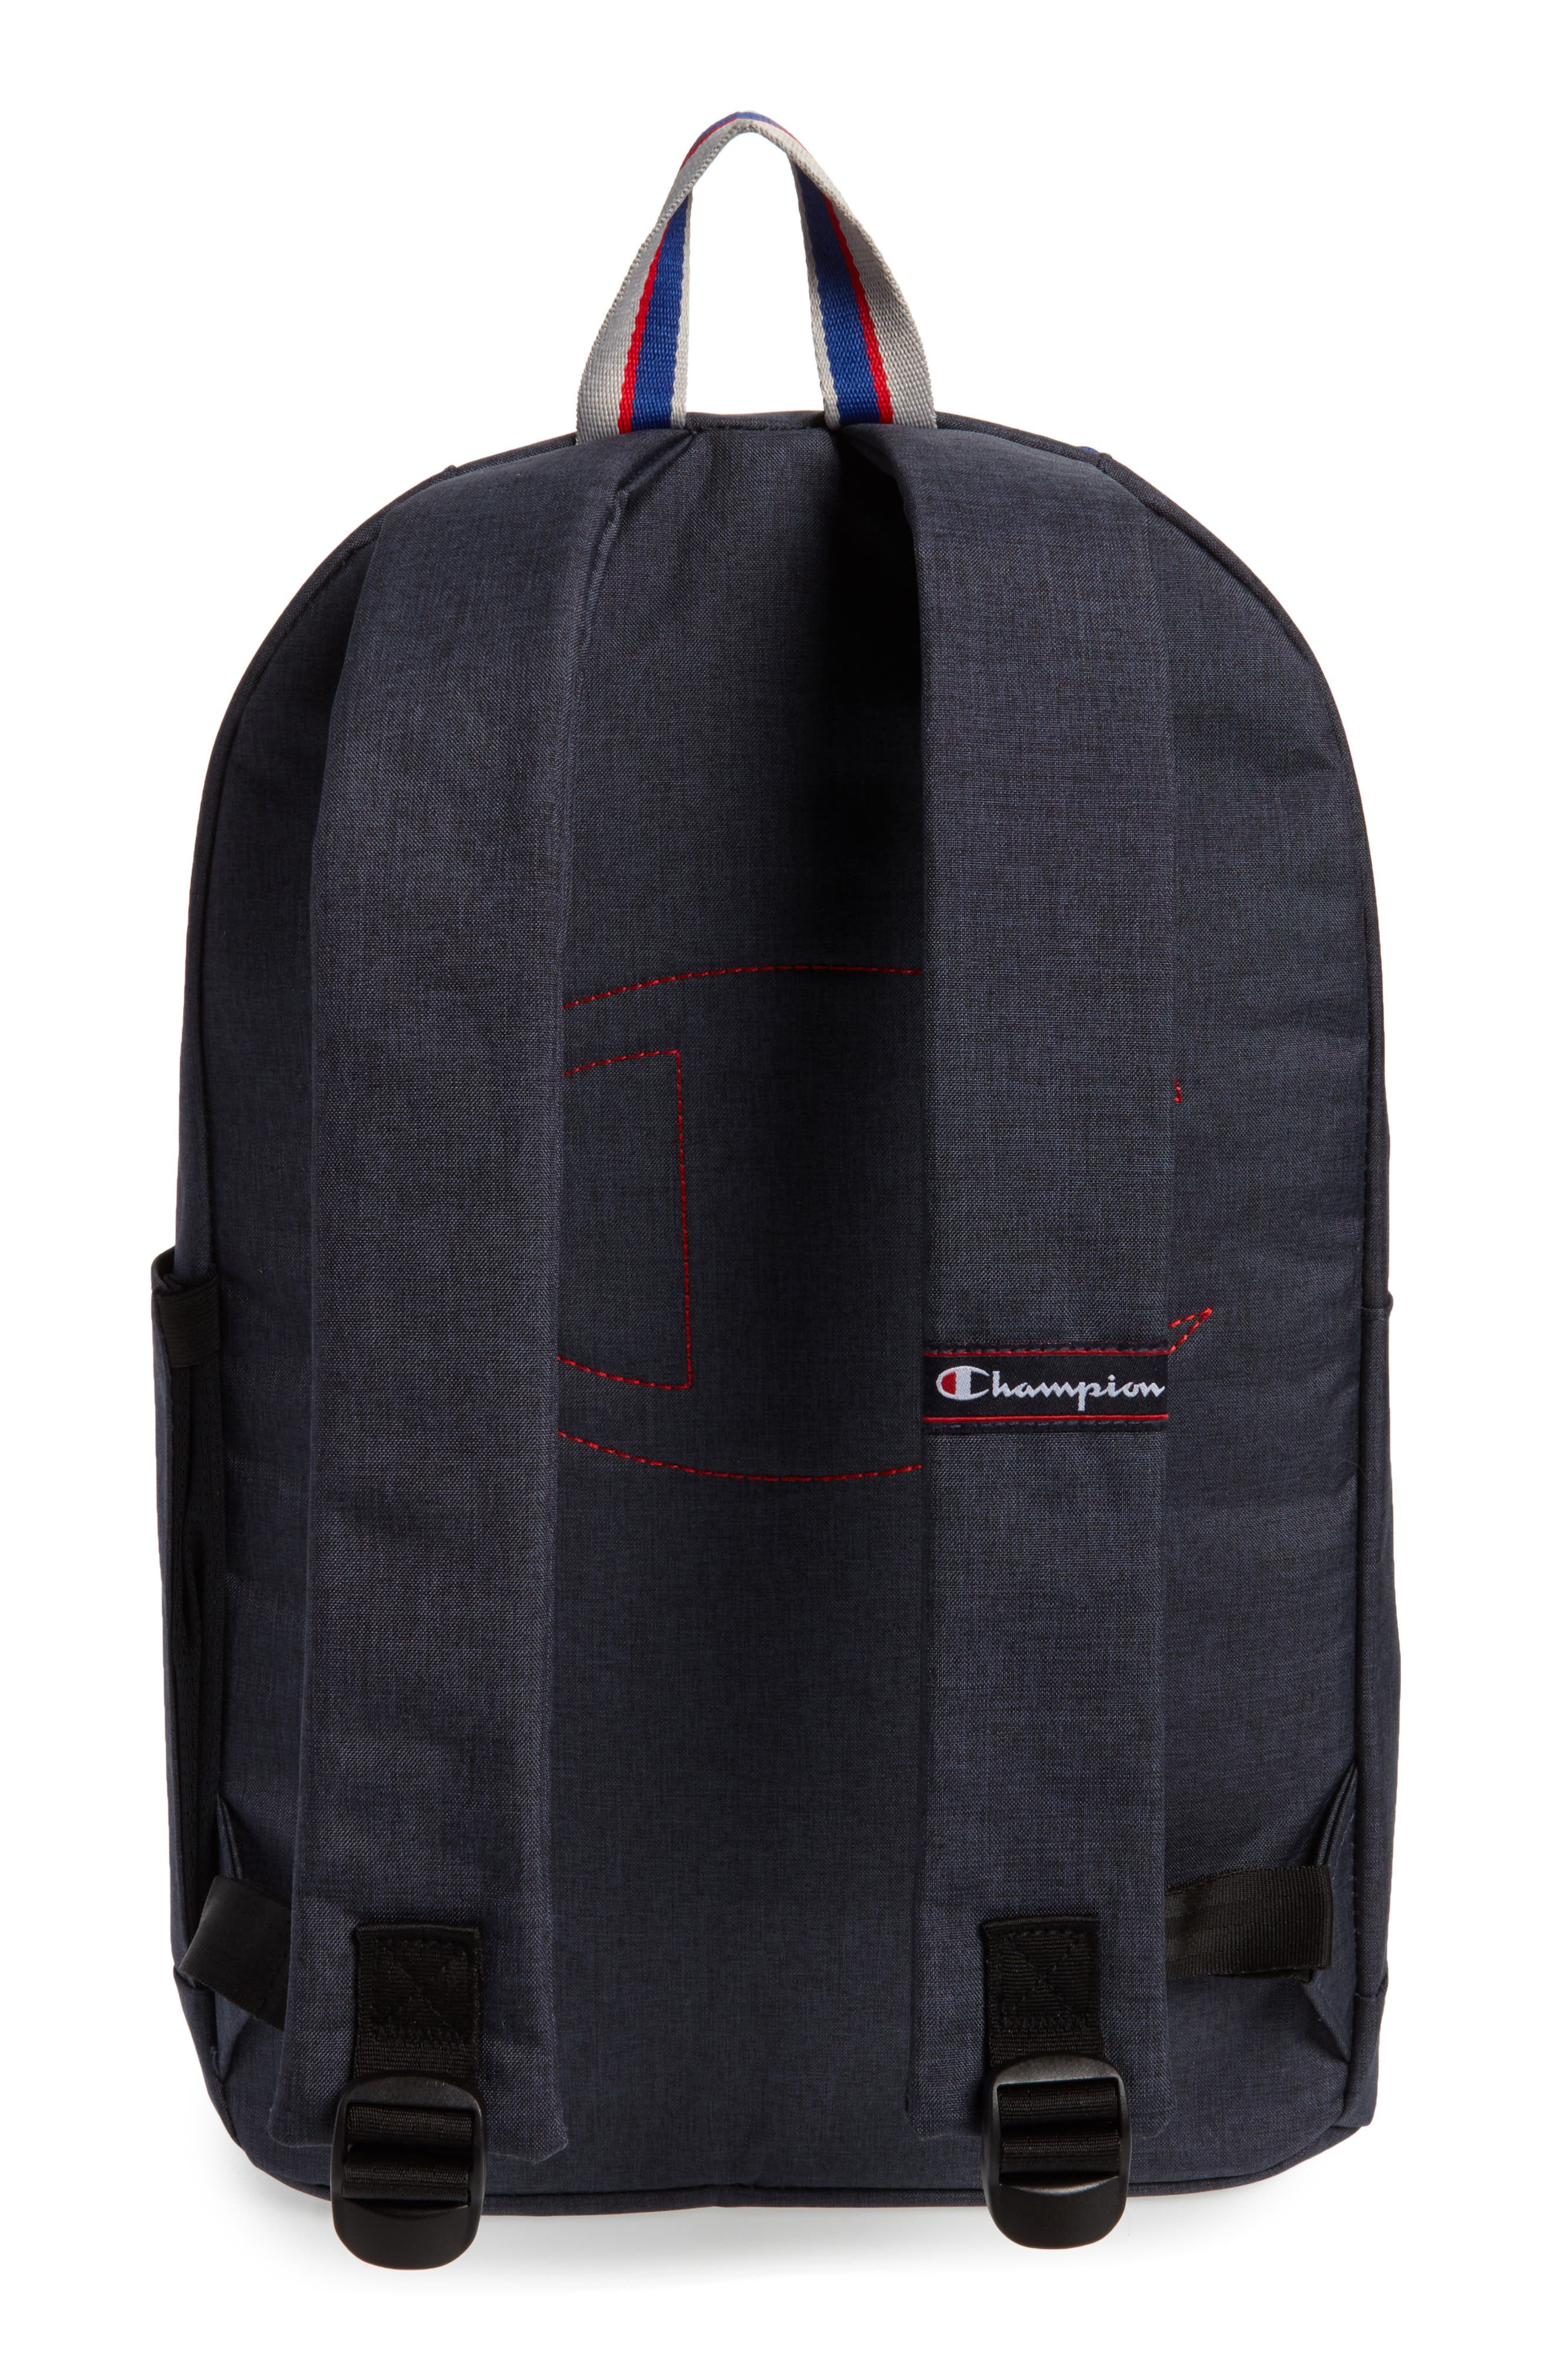 CHAMPION, Supercize Backpack, Alternate thumbnail 4, color, 410